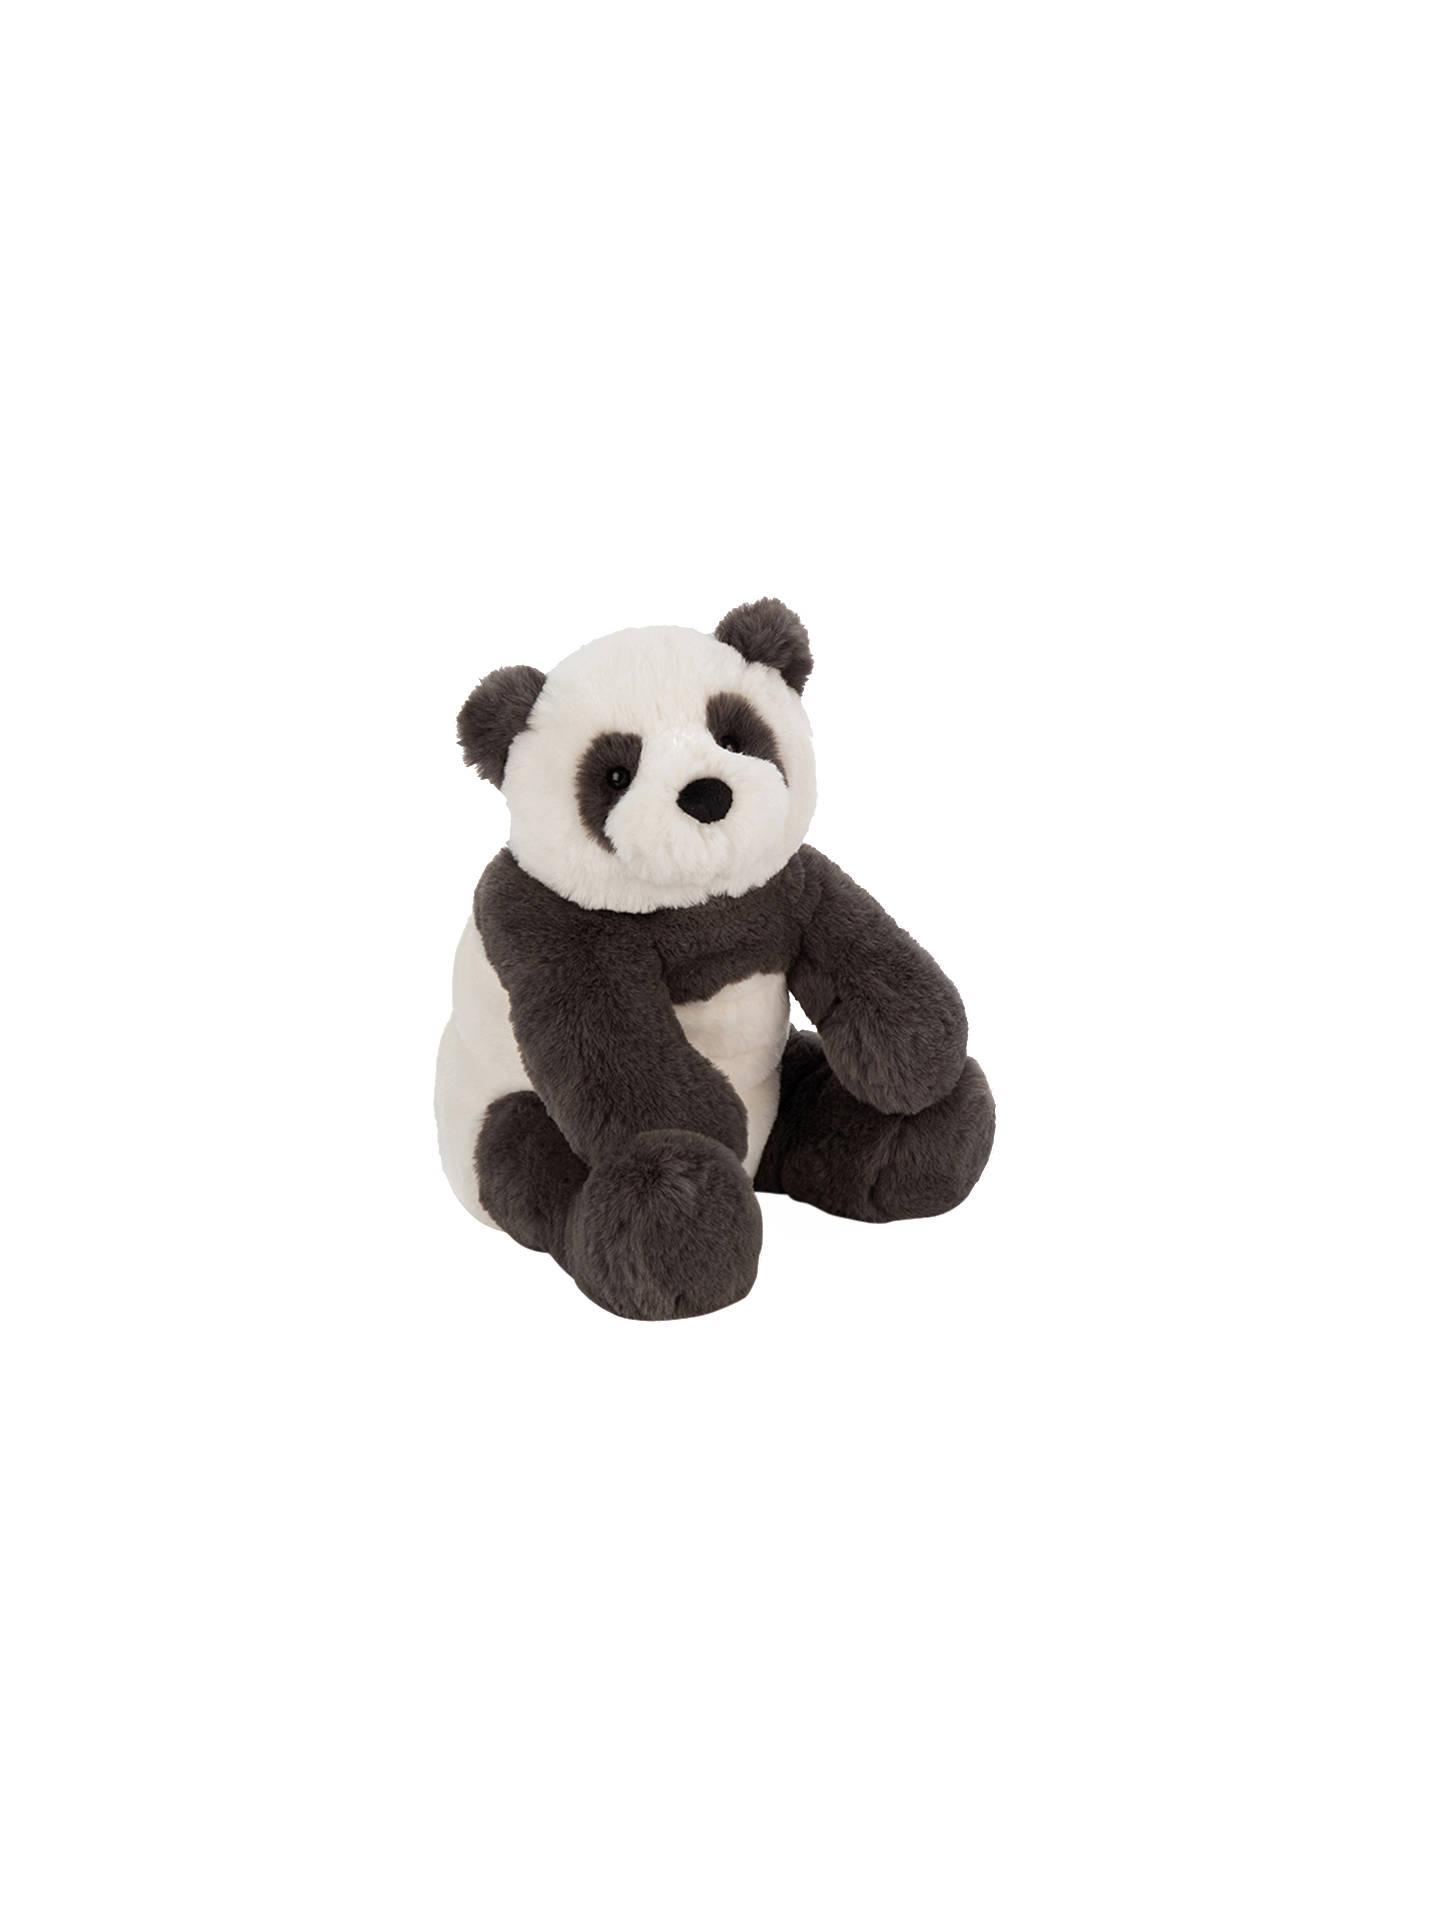 c53ac0179 Jellycat Harry Panda Cub Soft Toy, Large